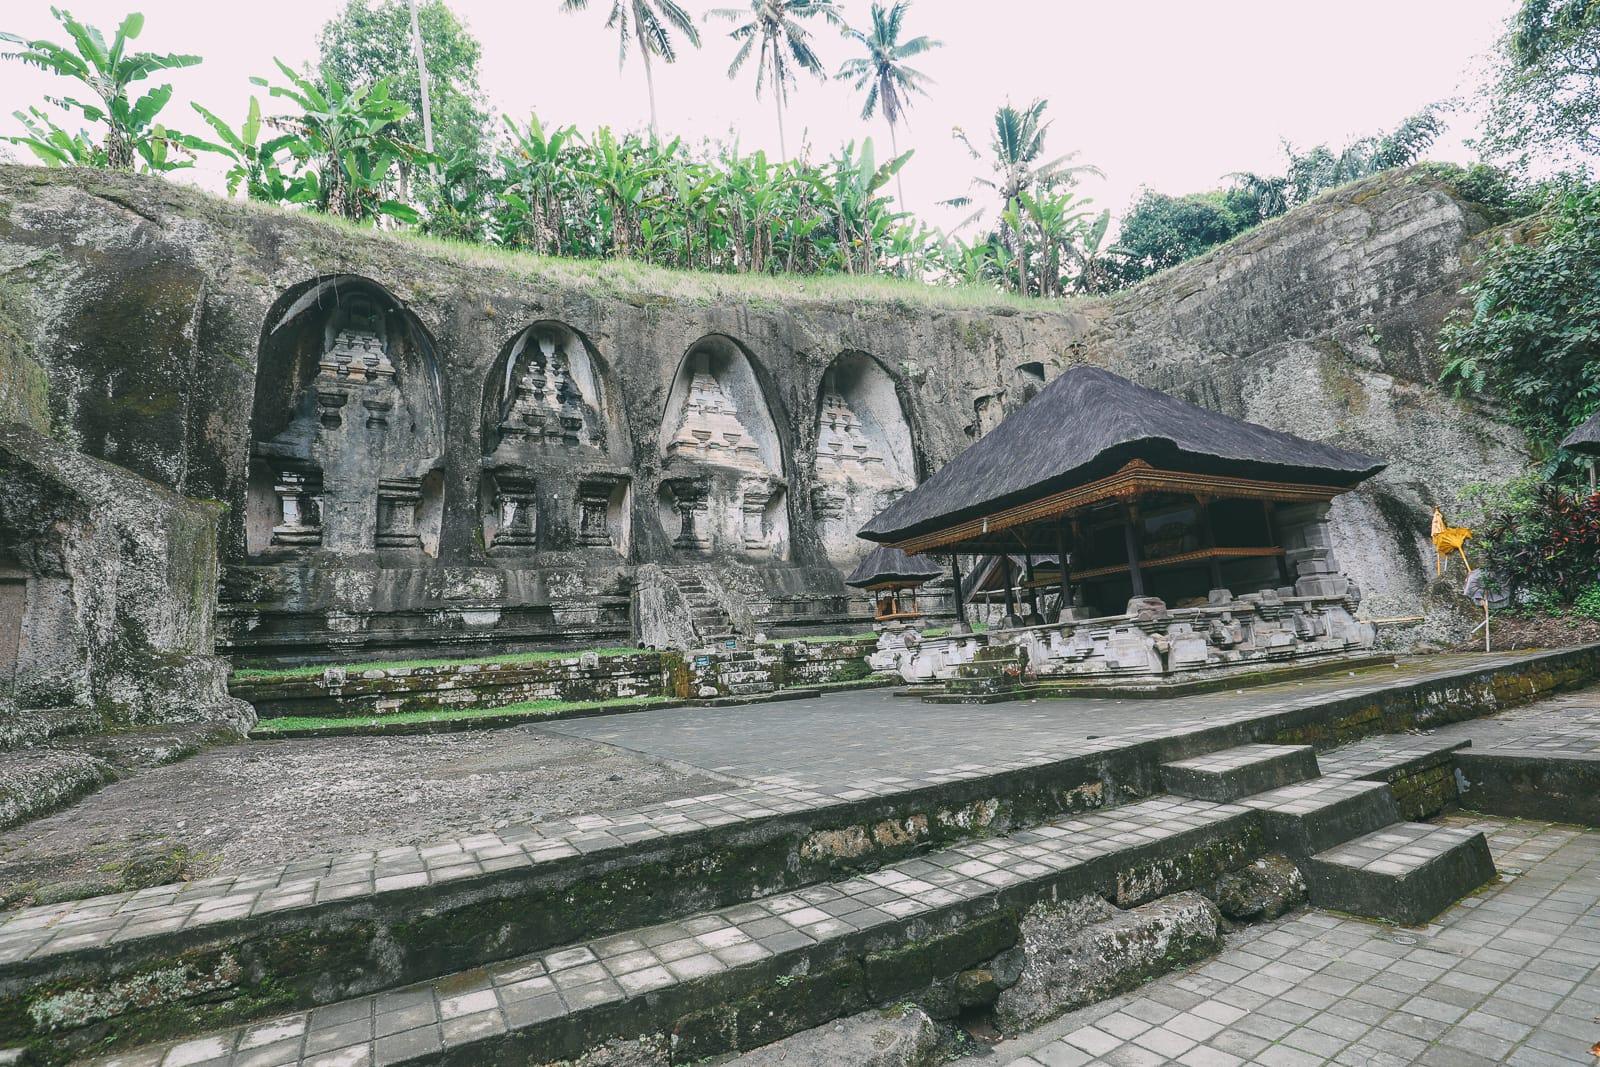 Bali Travel - Tegalalang Rice Terrace In Ubud And Gunung Kawi Temple (28)